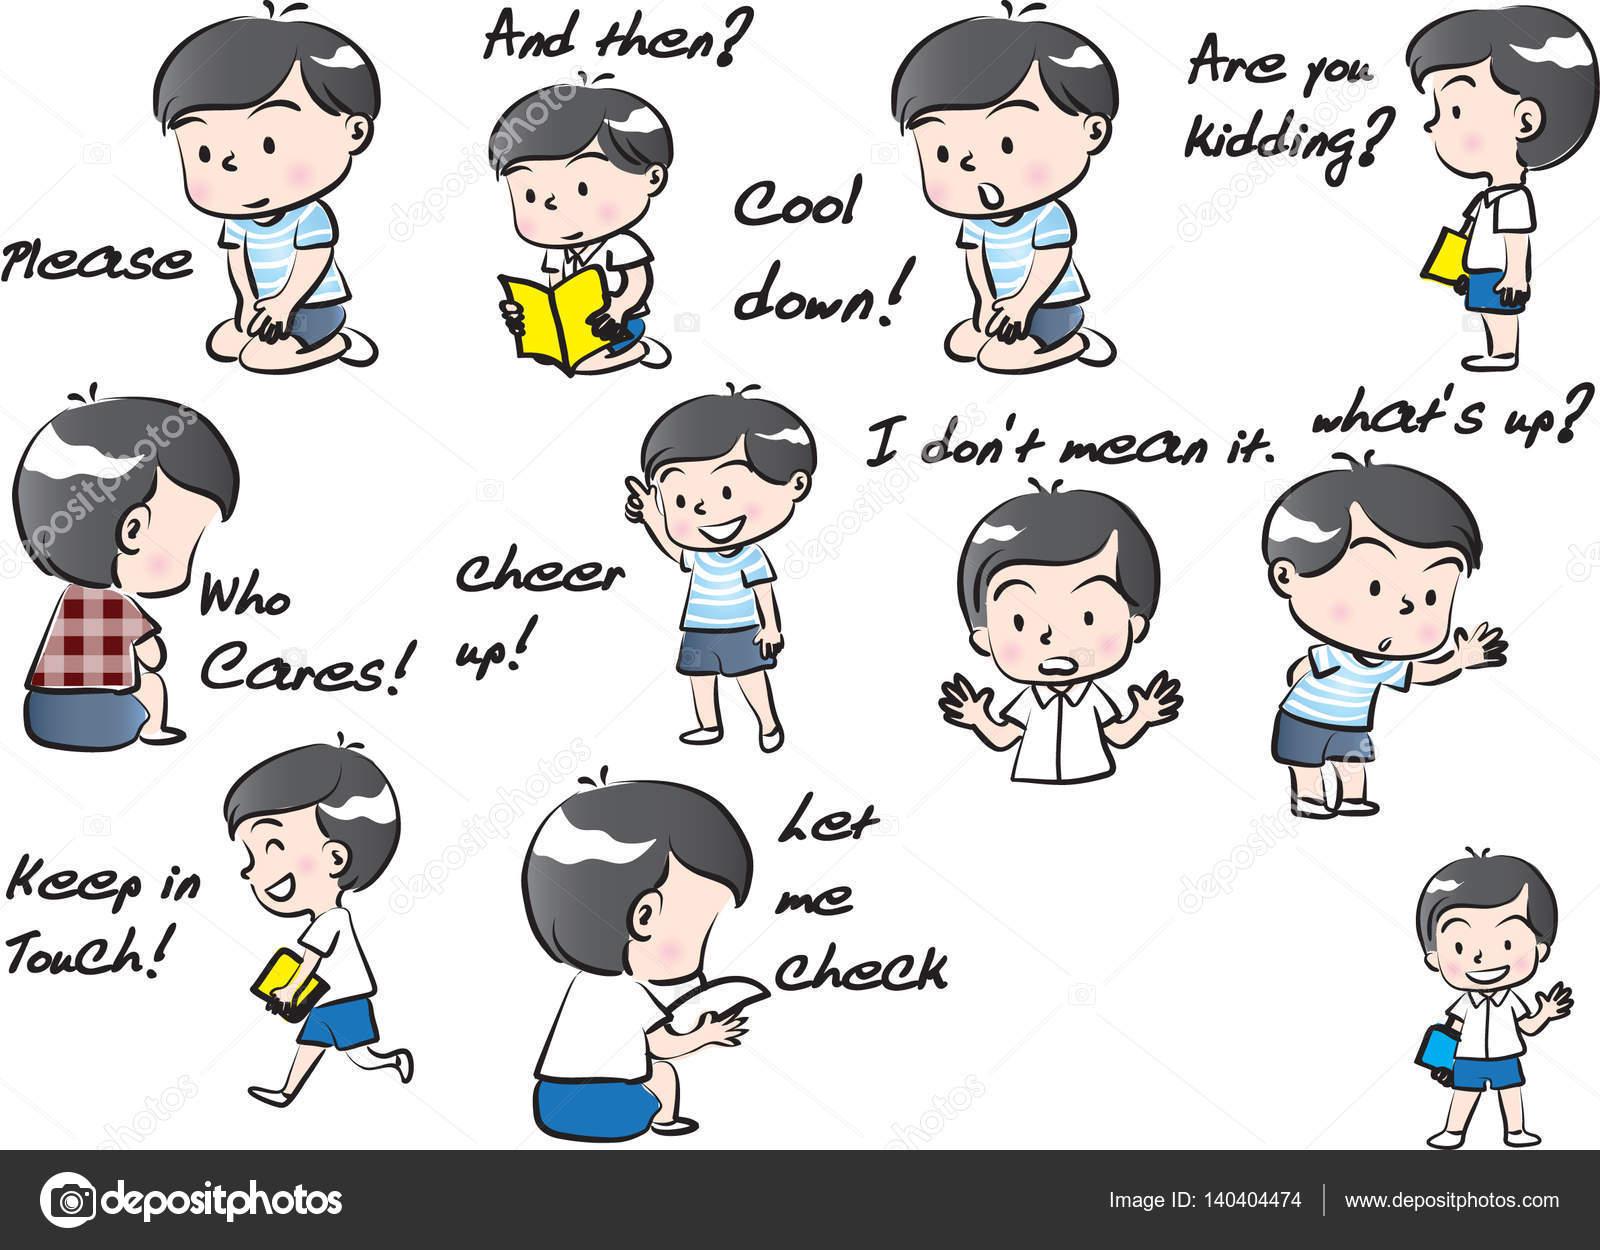 Junge mit Haustier Cartoon-Satz — Stockfoto © wenpei #140404474